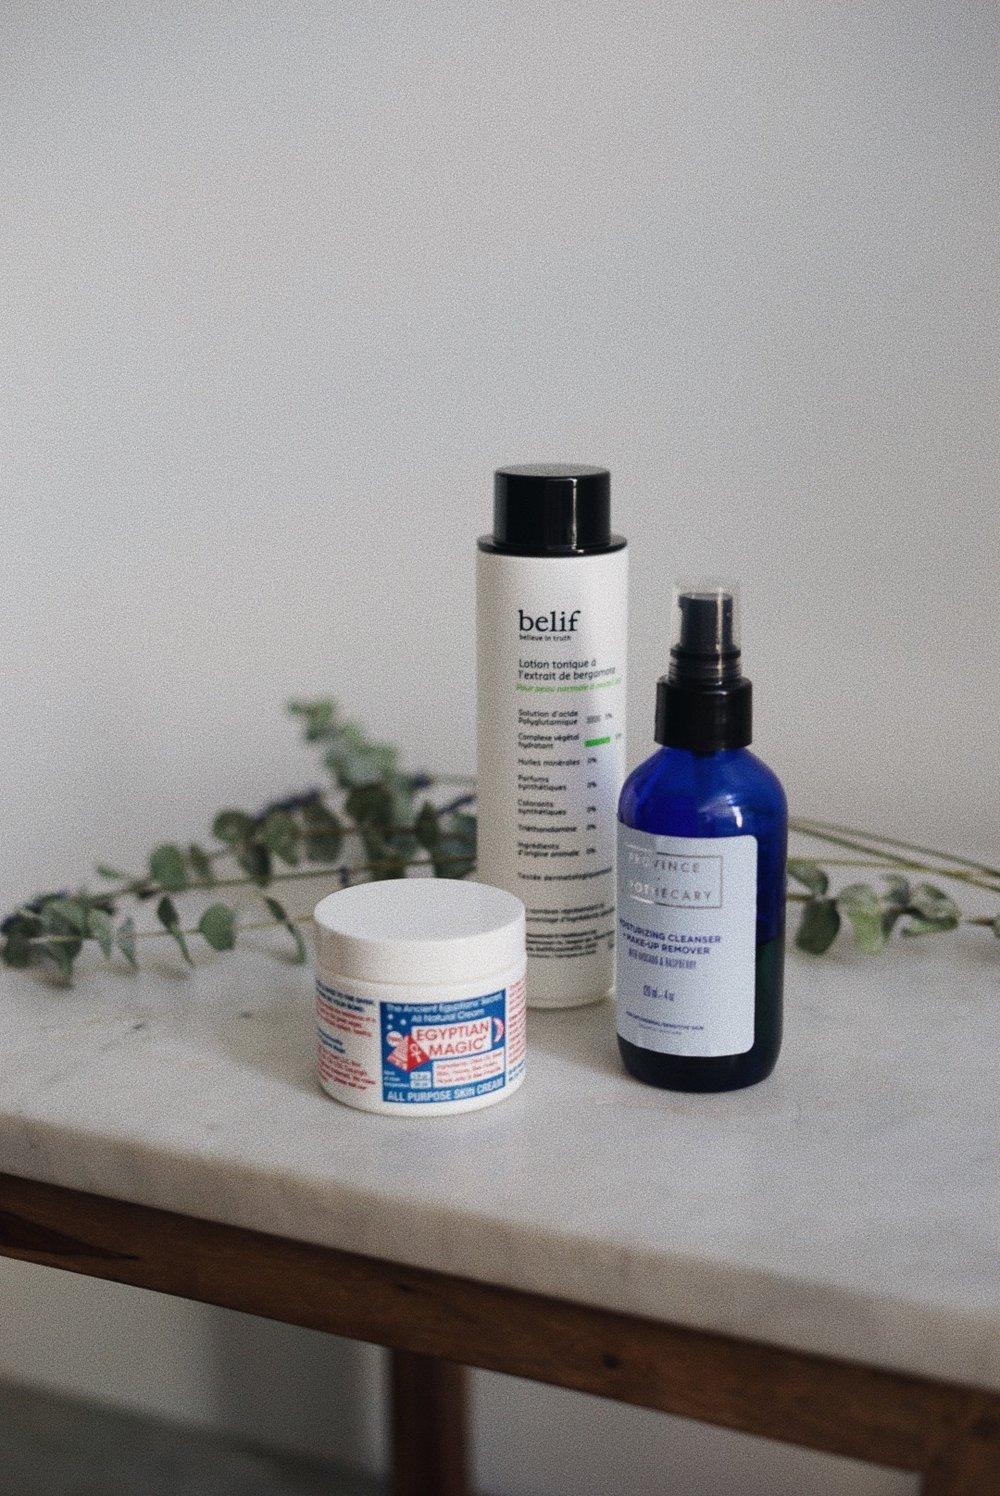 Day Products - Province ApothecaryMoisturizing Cleanser + Make Up Remover BelifBergamot Herbal Face TonerEgyptian Magic Face Cream